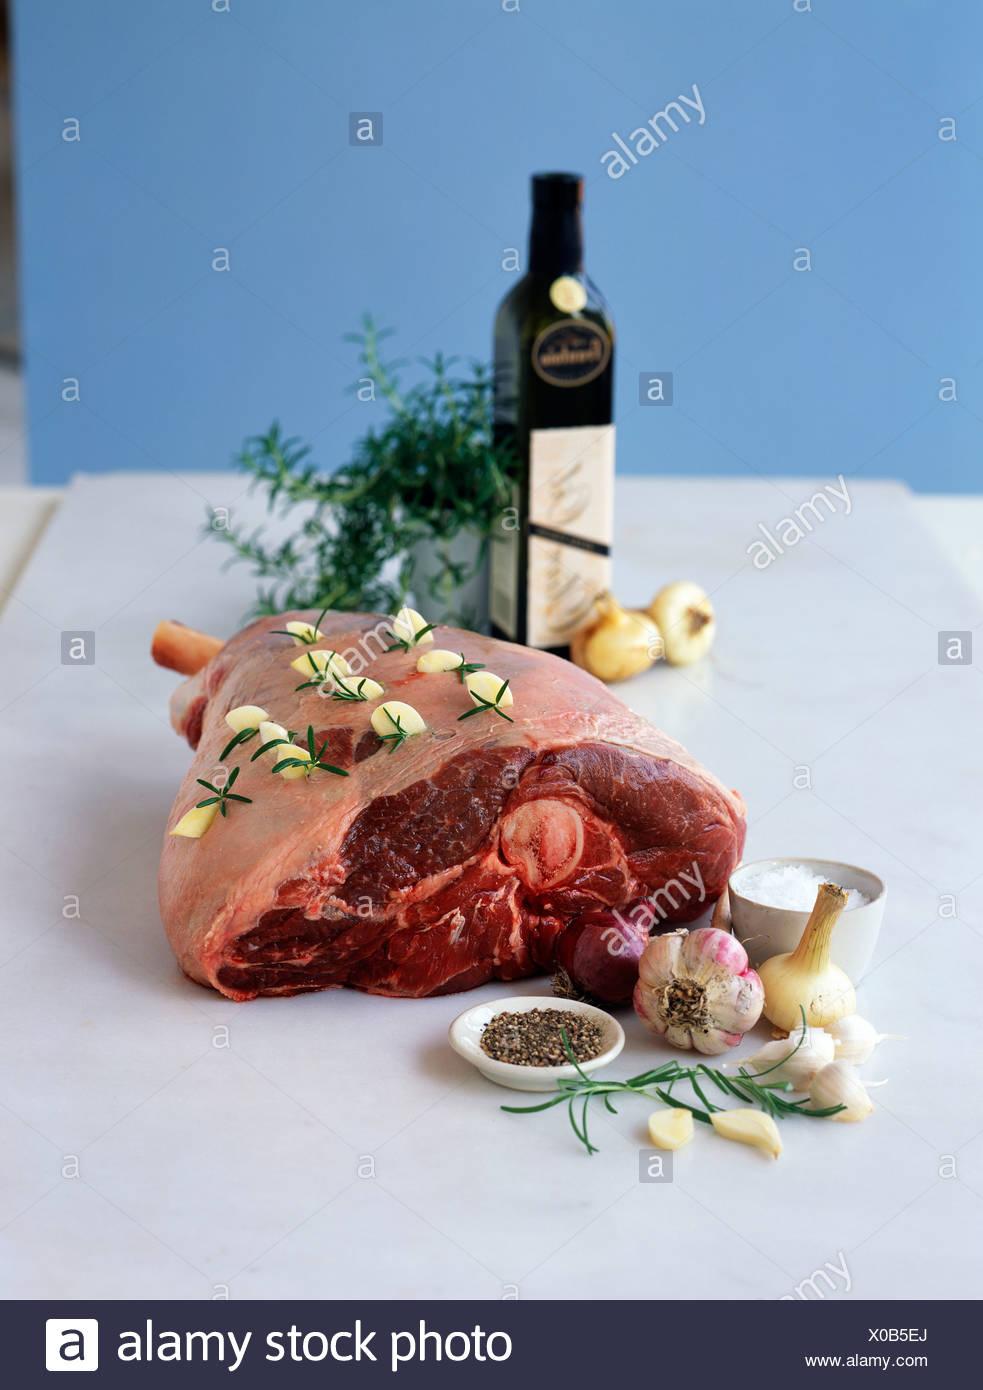 Raw leg of lamb pricked with garlic and rosemary - Stock Image